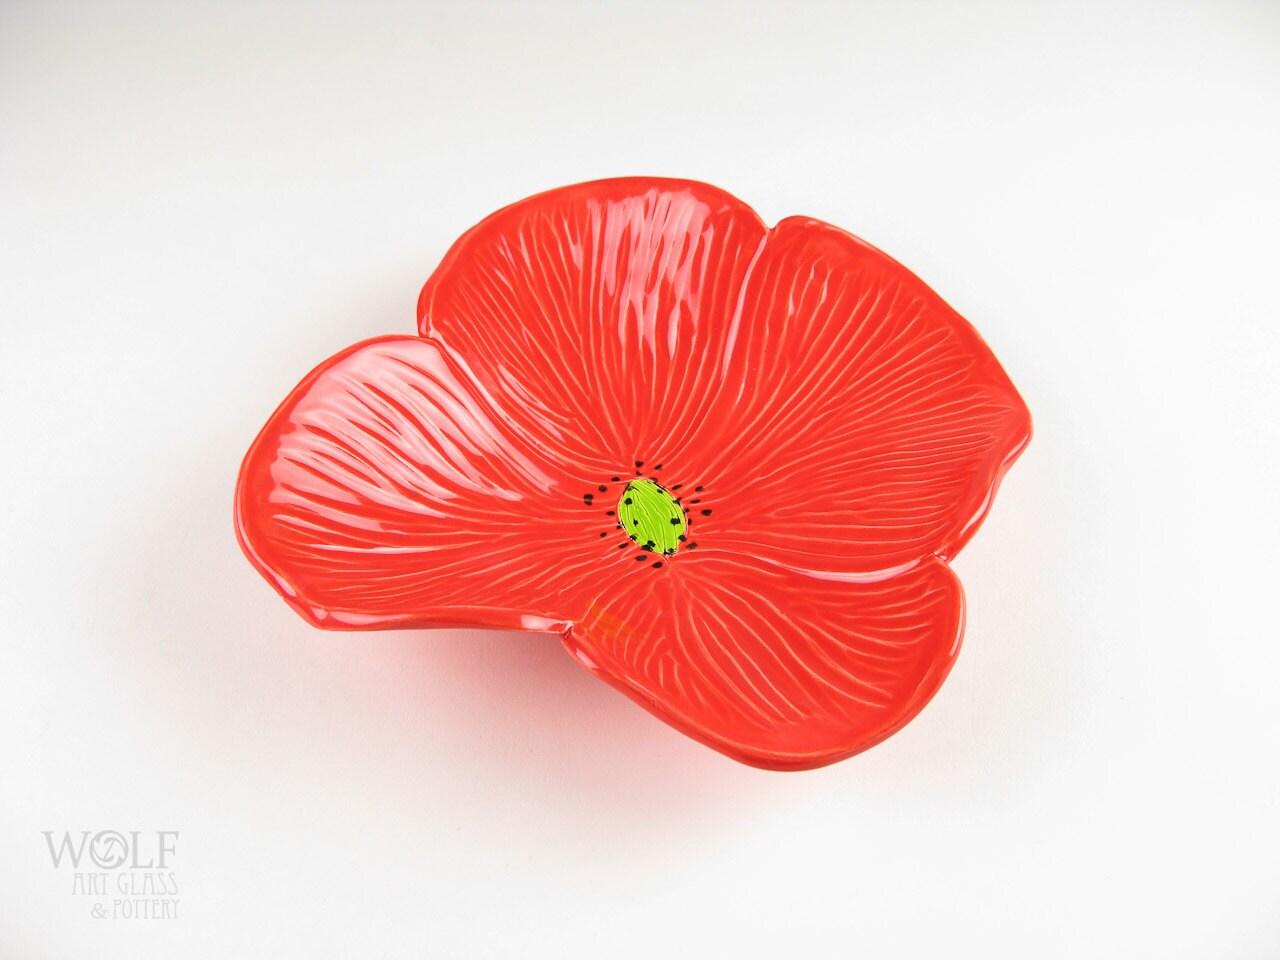 Red Poppy Wall Decor : Ceramic wall art tomato red poppy flower home decor